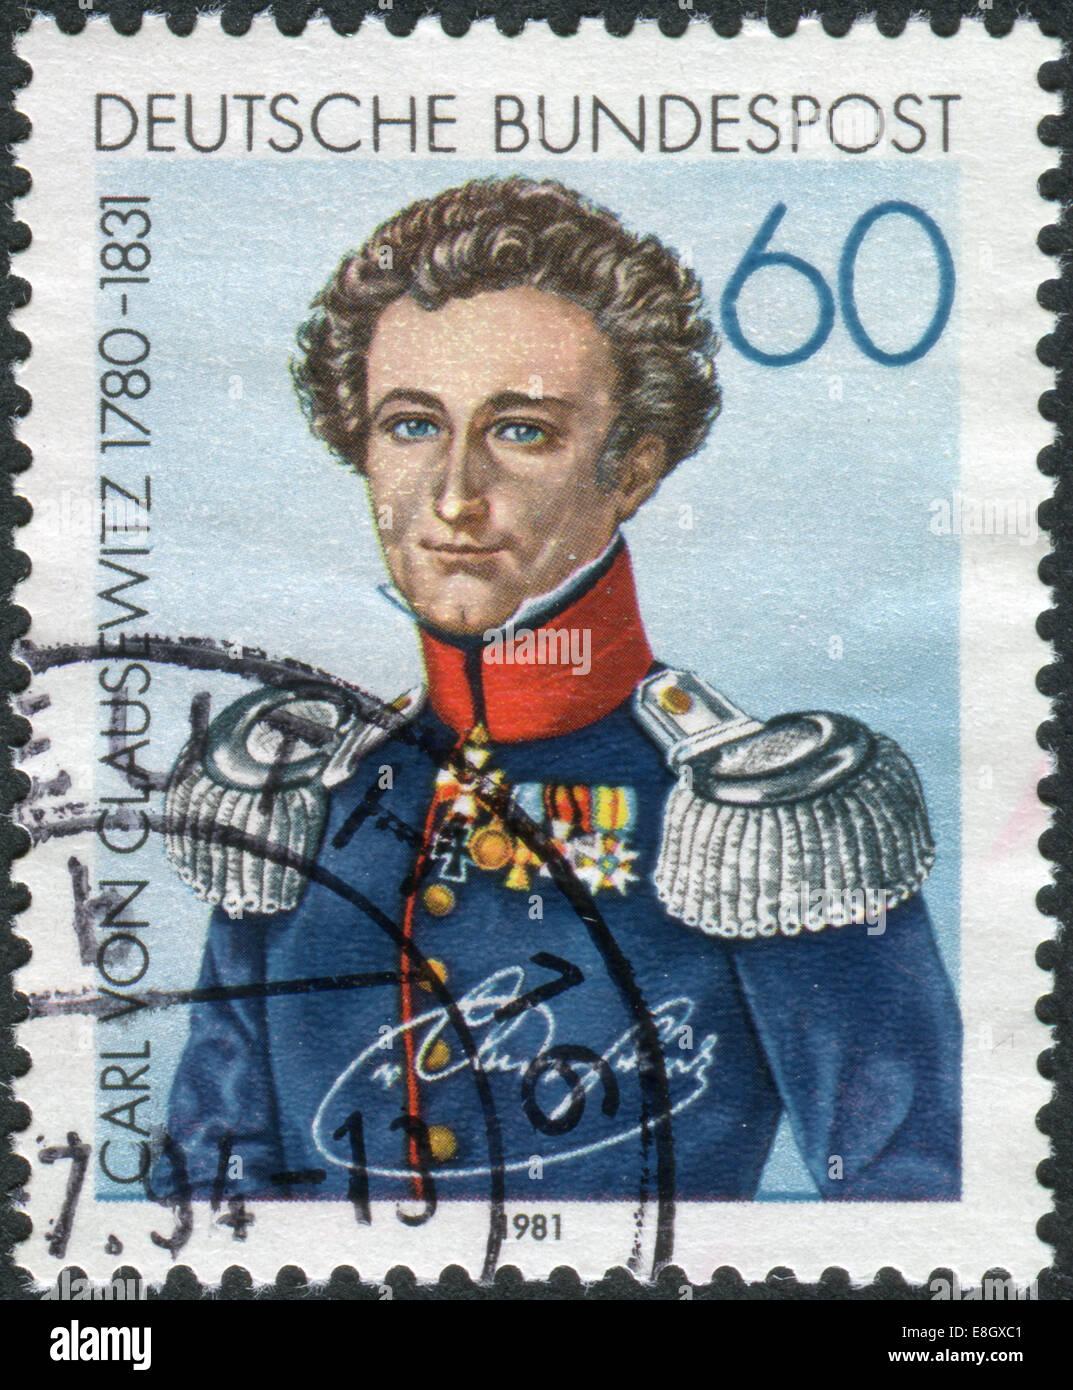 GERMANY - CIRCA 1981: Postage stamp printed in Germany, shows Carl Philipp Gottfried von Clausewitz, circa 1981 Stock Photo